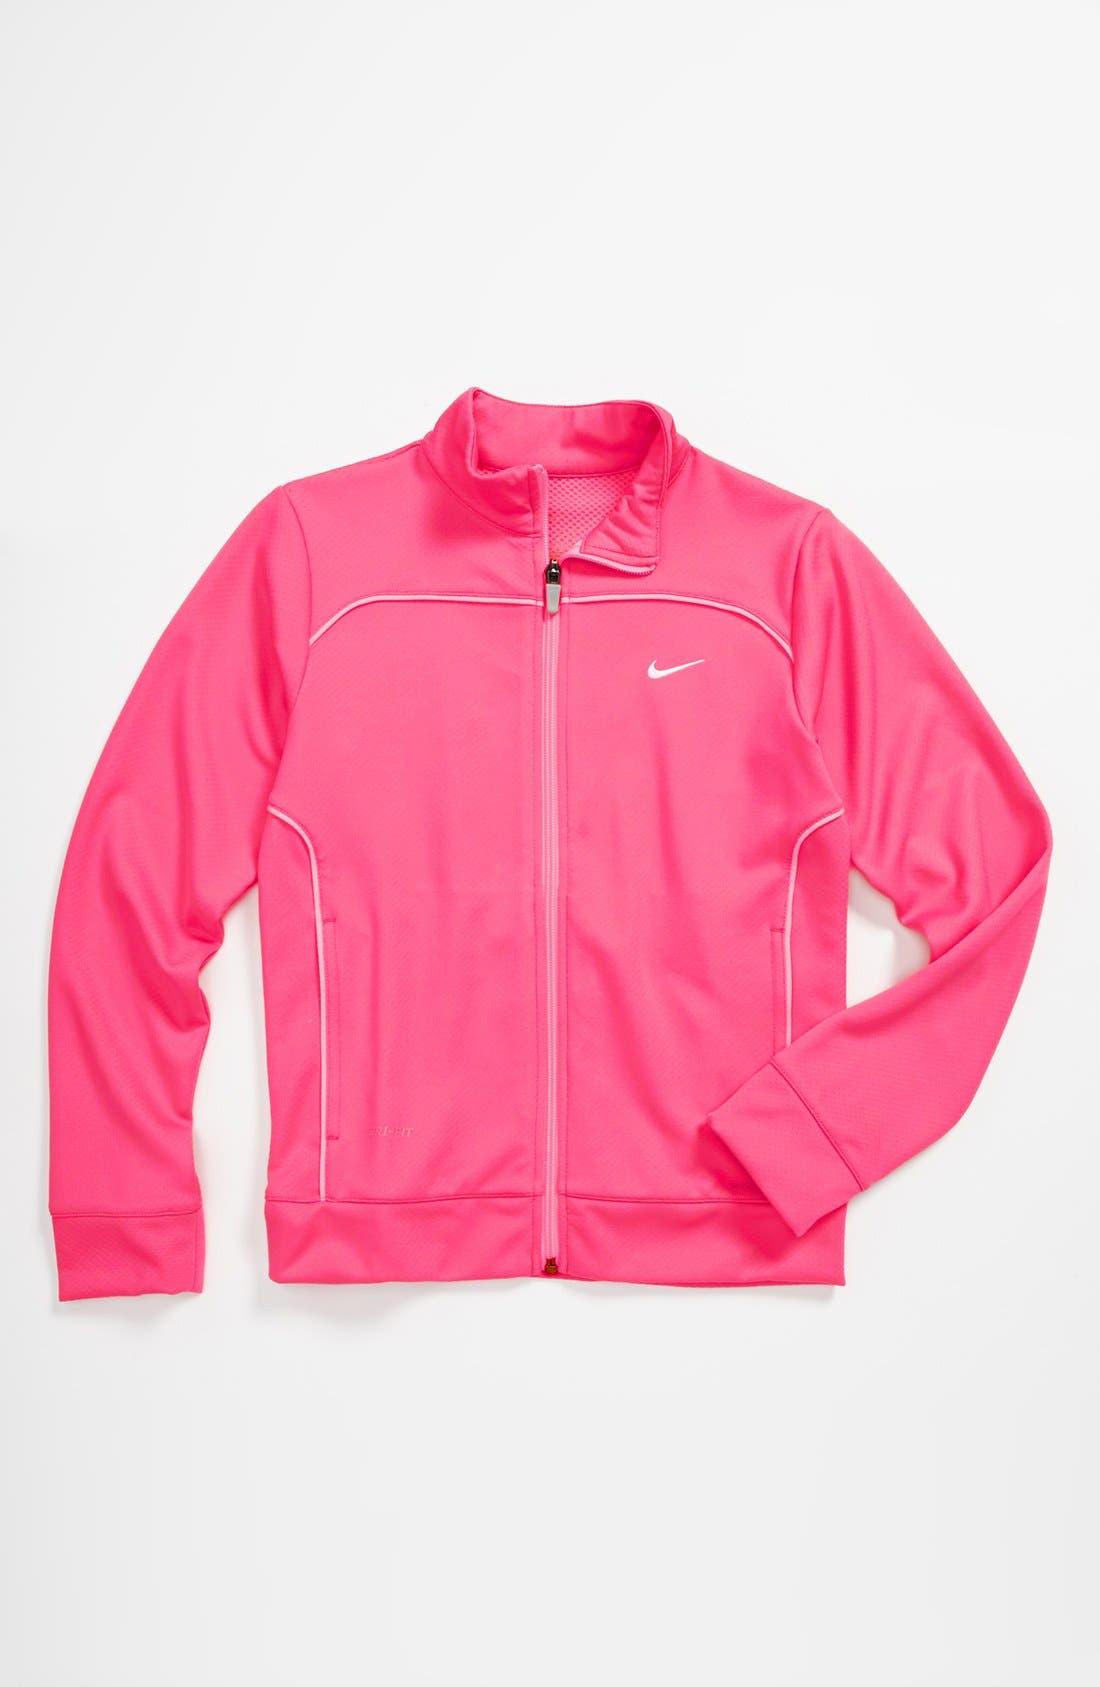 Main Image - Nike Dri-FIT Jacket (Big Girls)